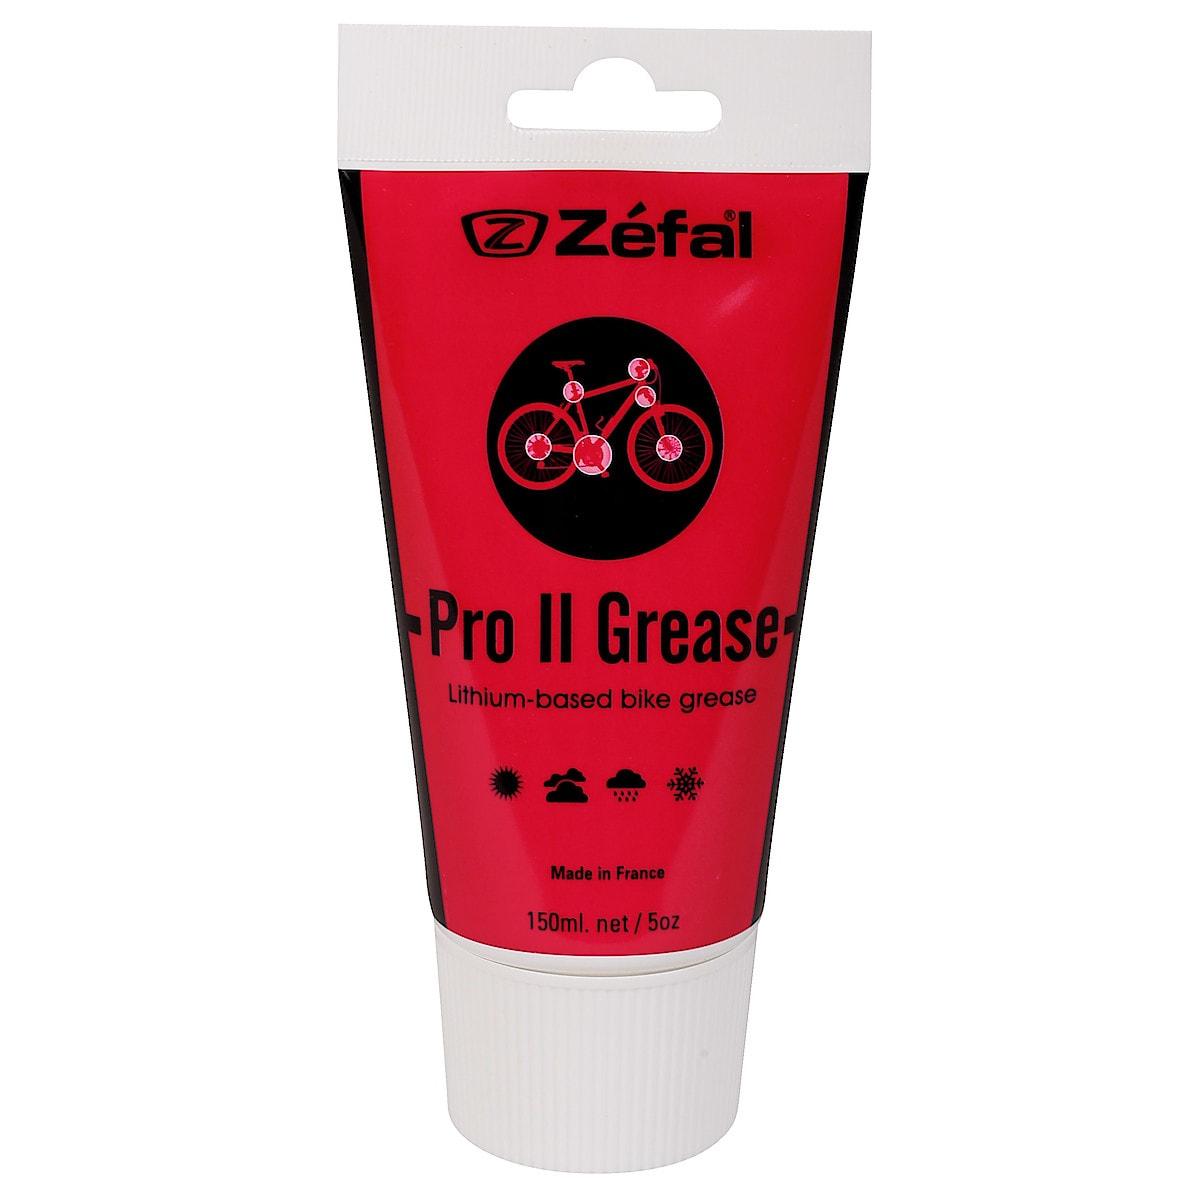 Pyörärasva Zéfal Pro II Grease